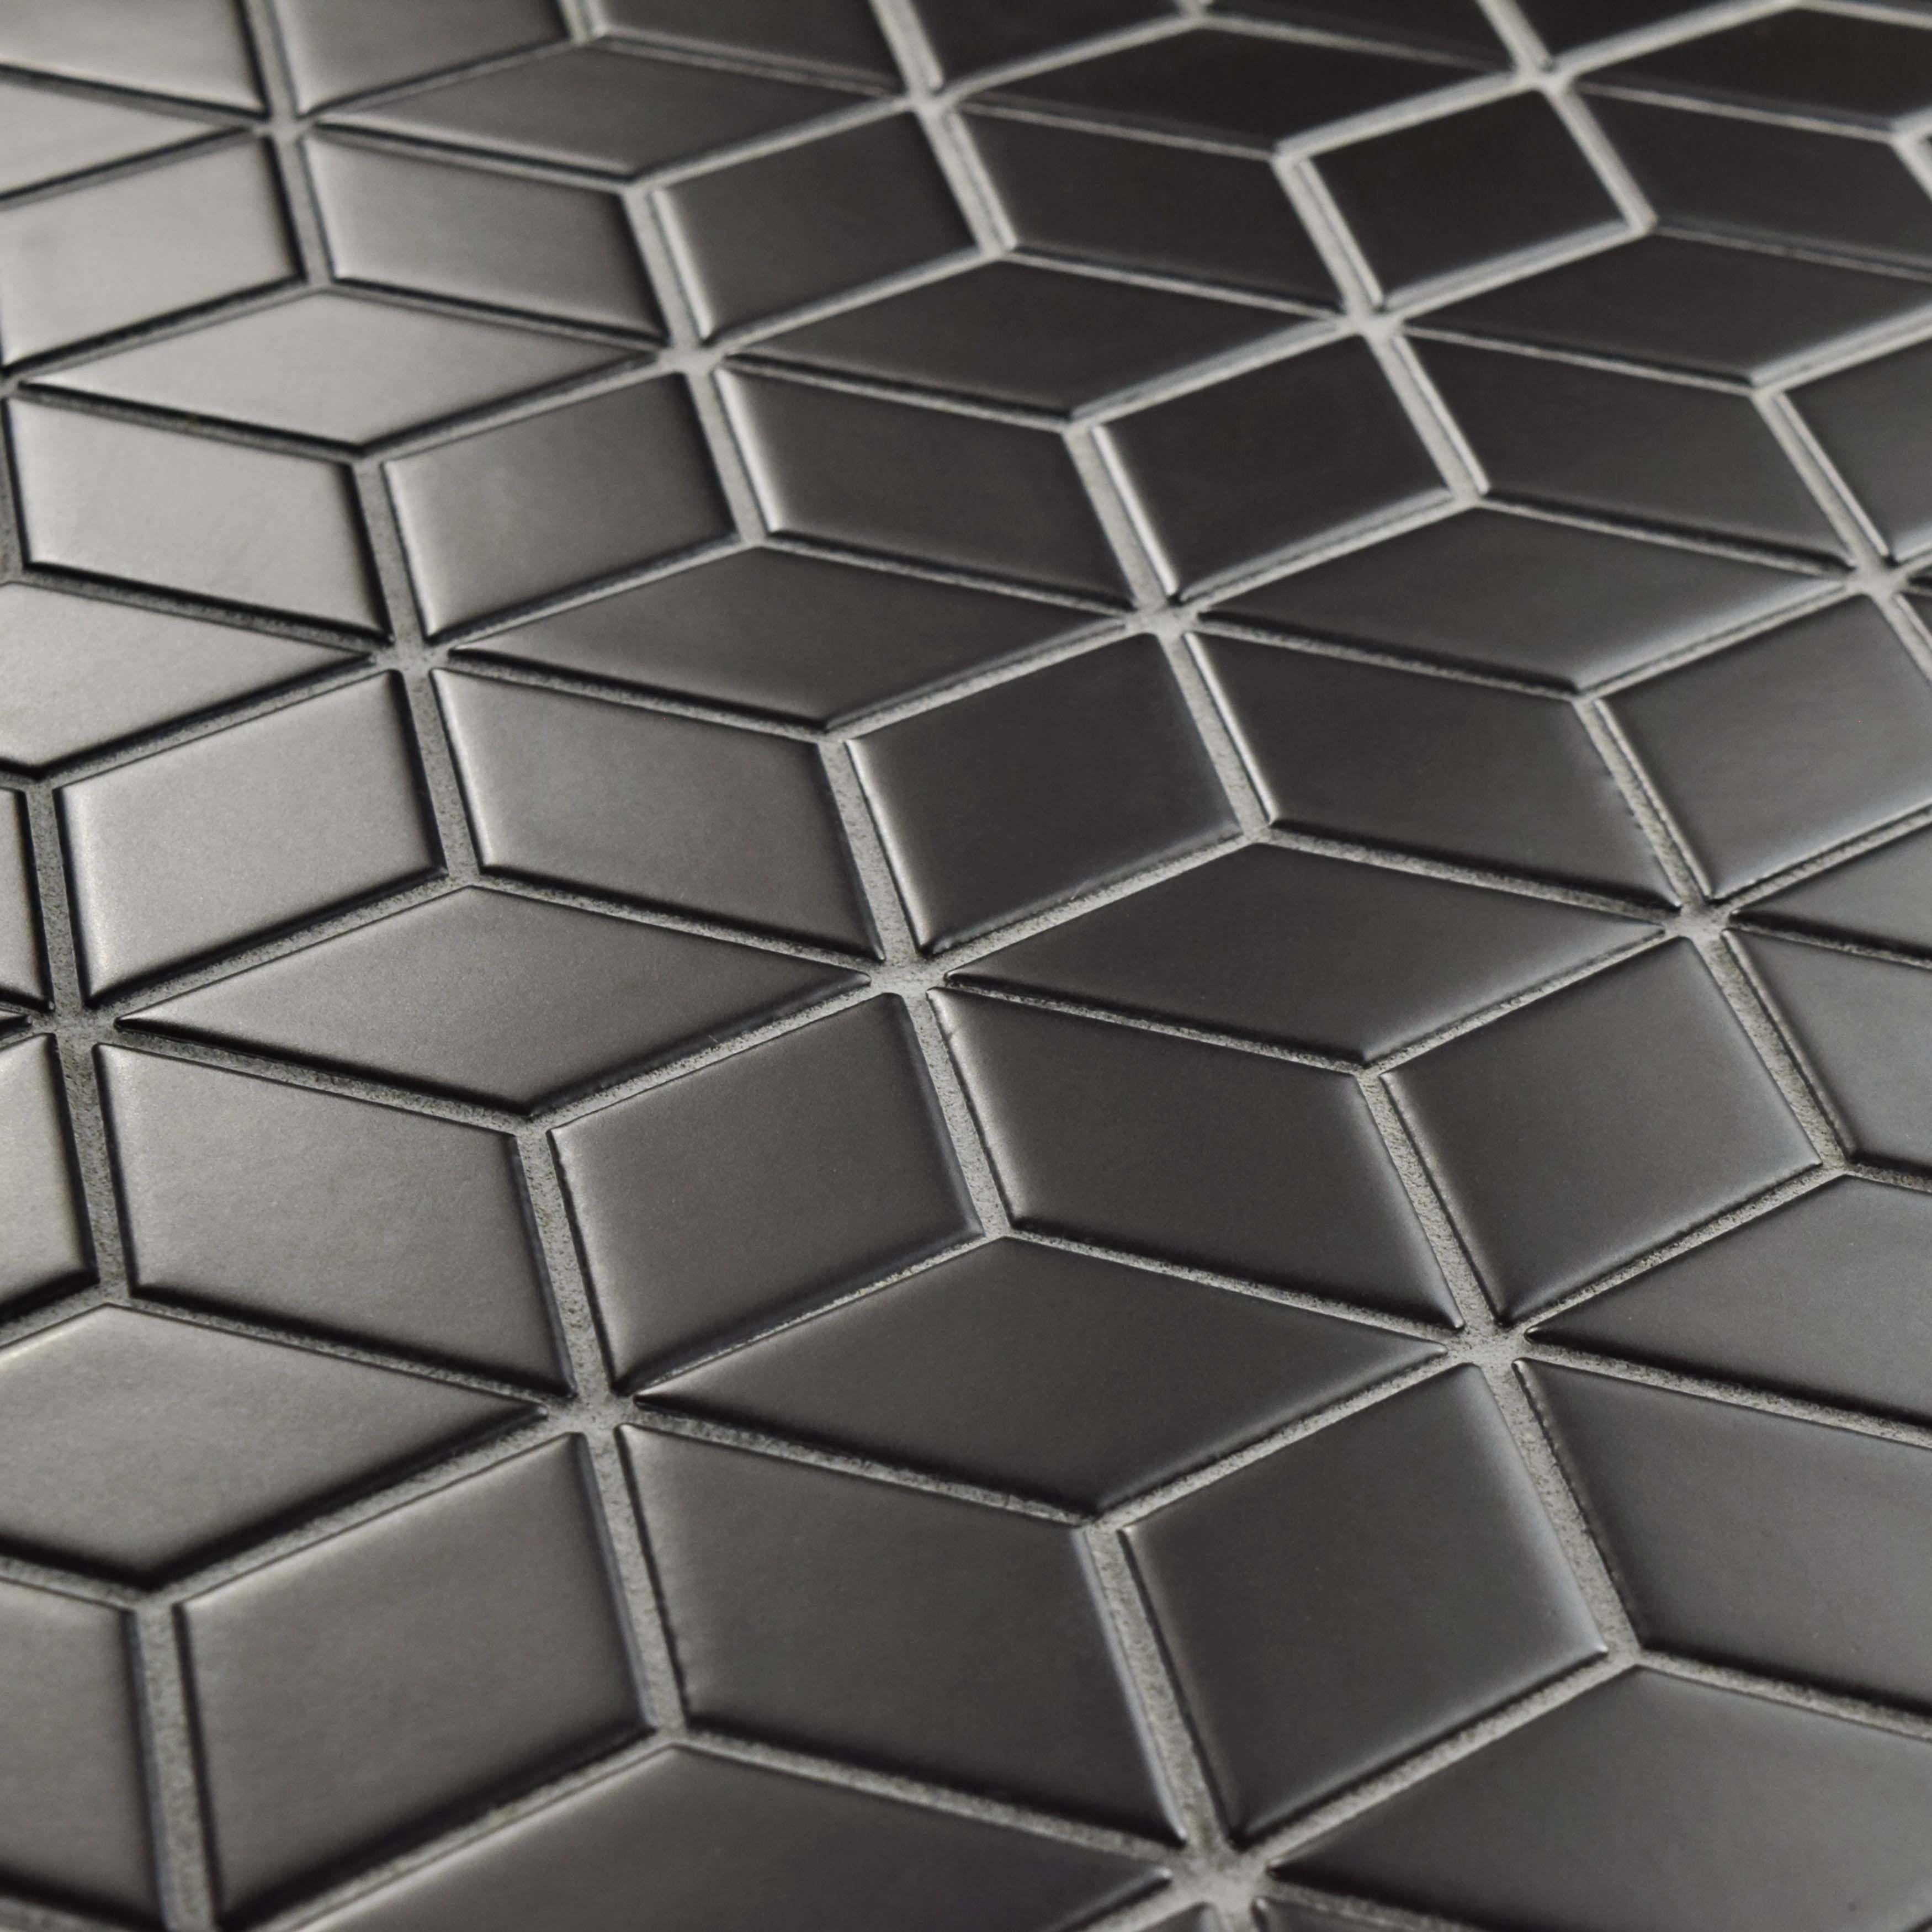 Somertile 10 5x12 125 Inch Victorian Rhombus Matte Black Porcelain